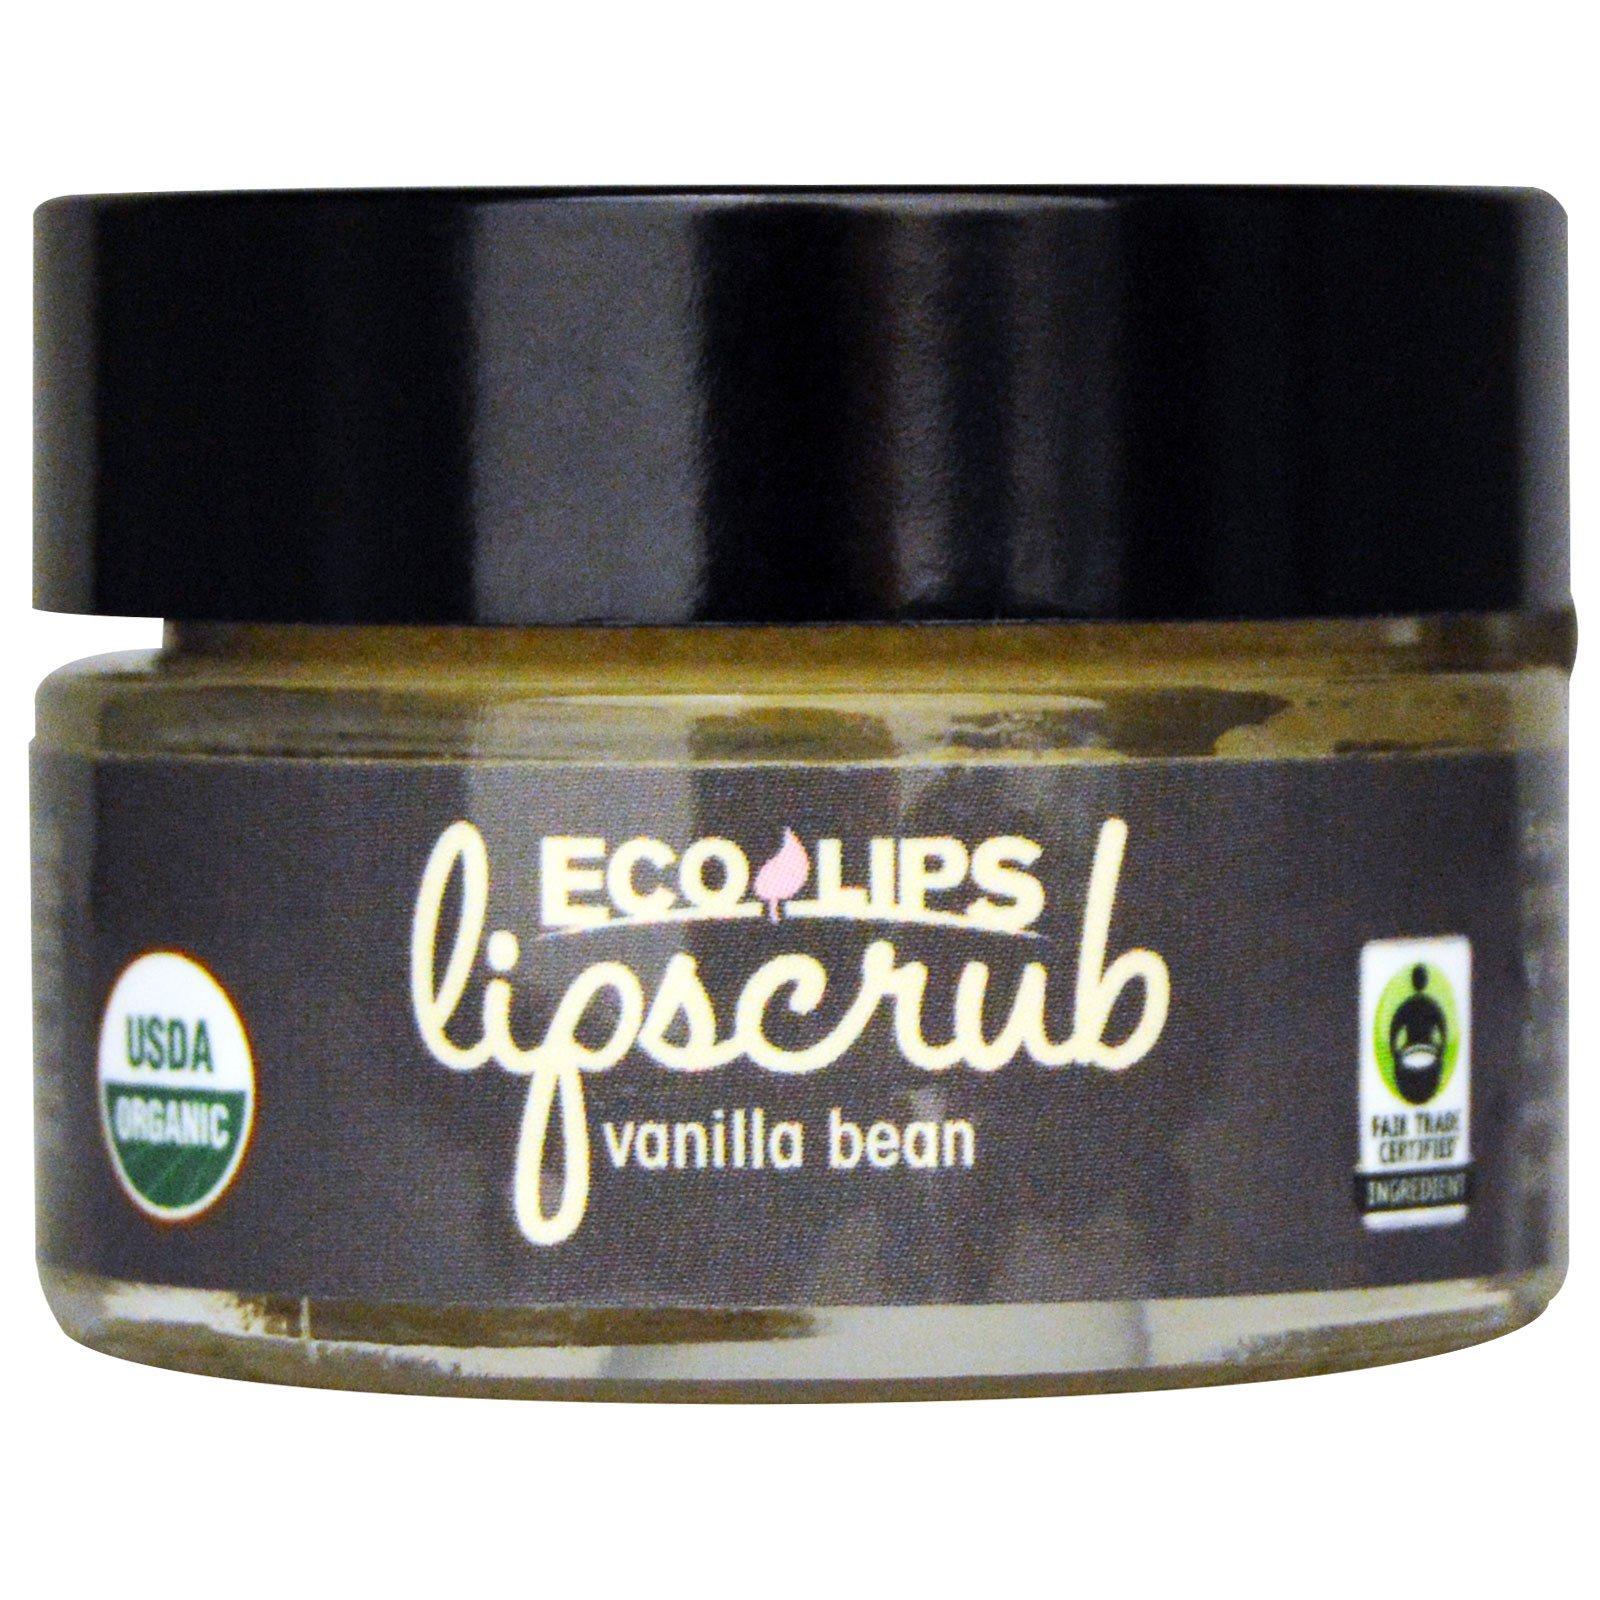 Eco Lips - Organic Lip Scrub Brown Sugar - 0.5 oz. (pack of 3) DFI Anti Aging Eye Serum